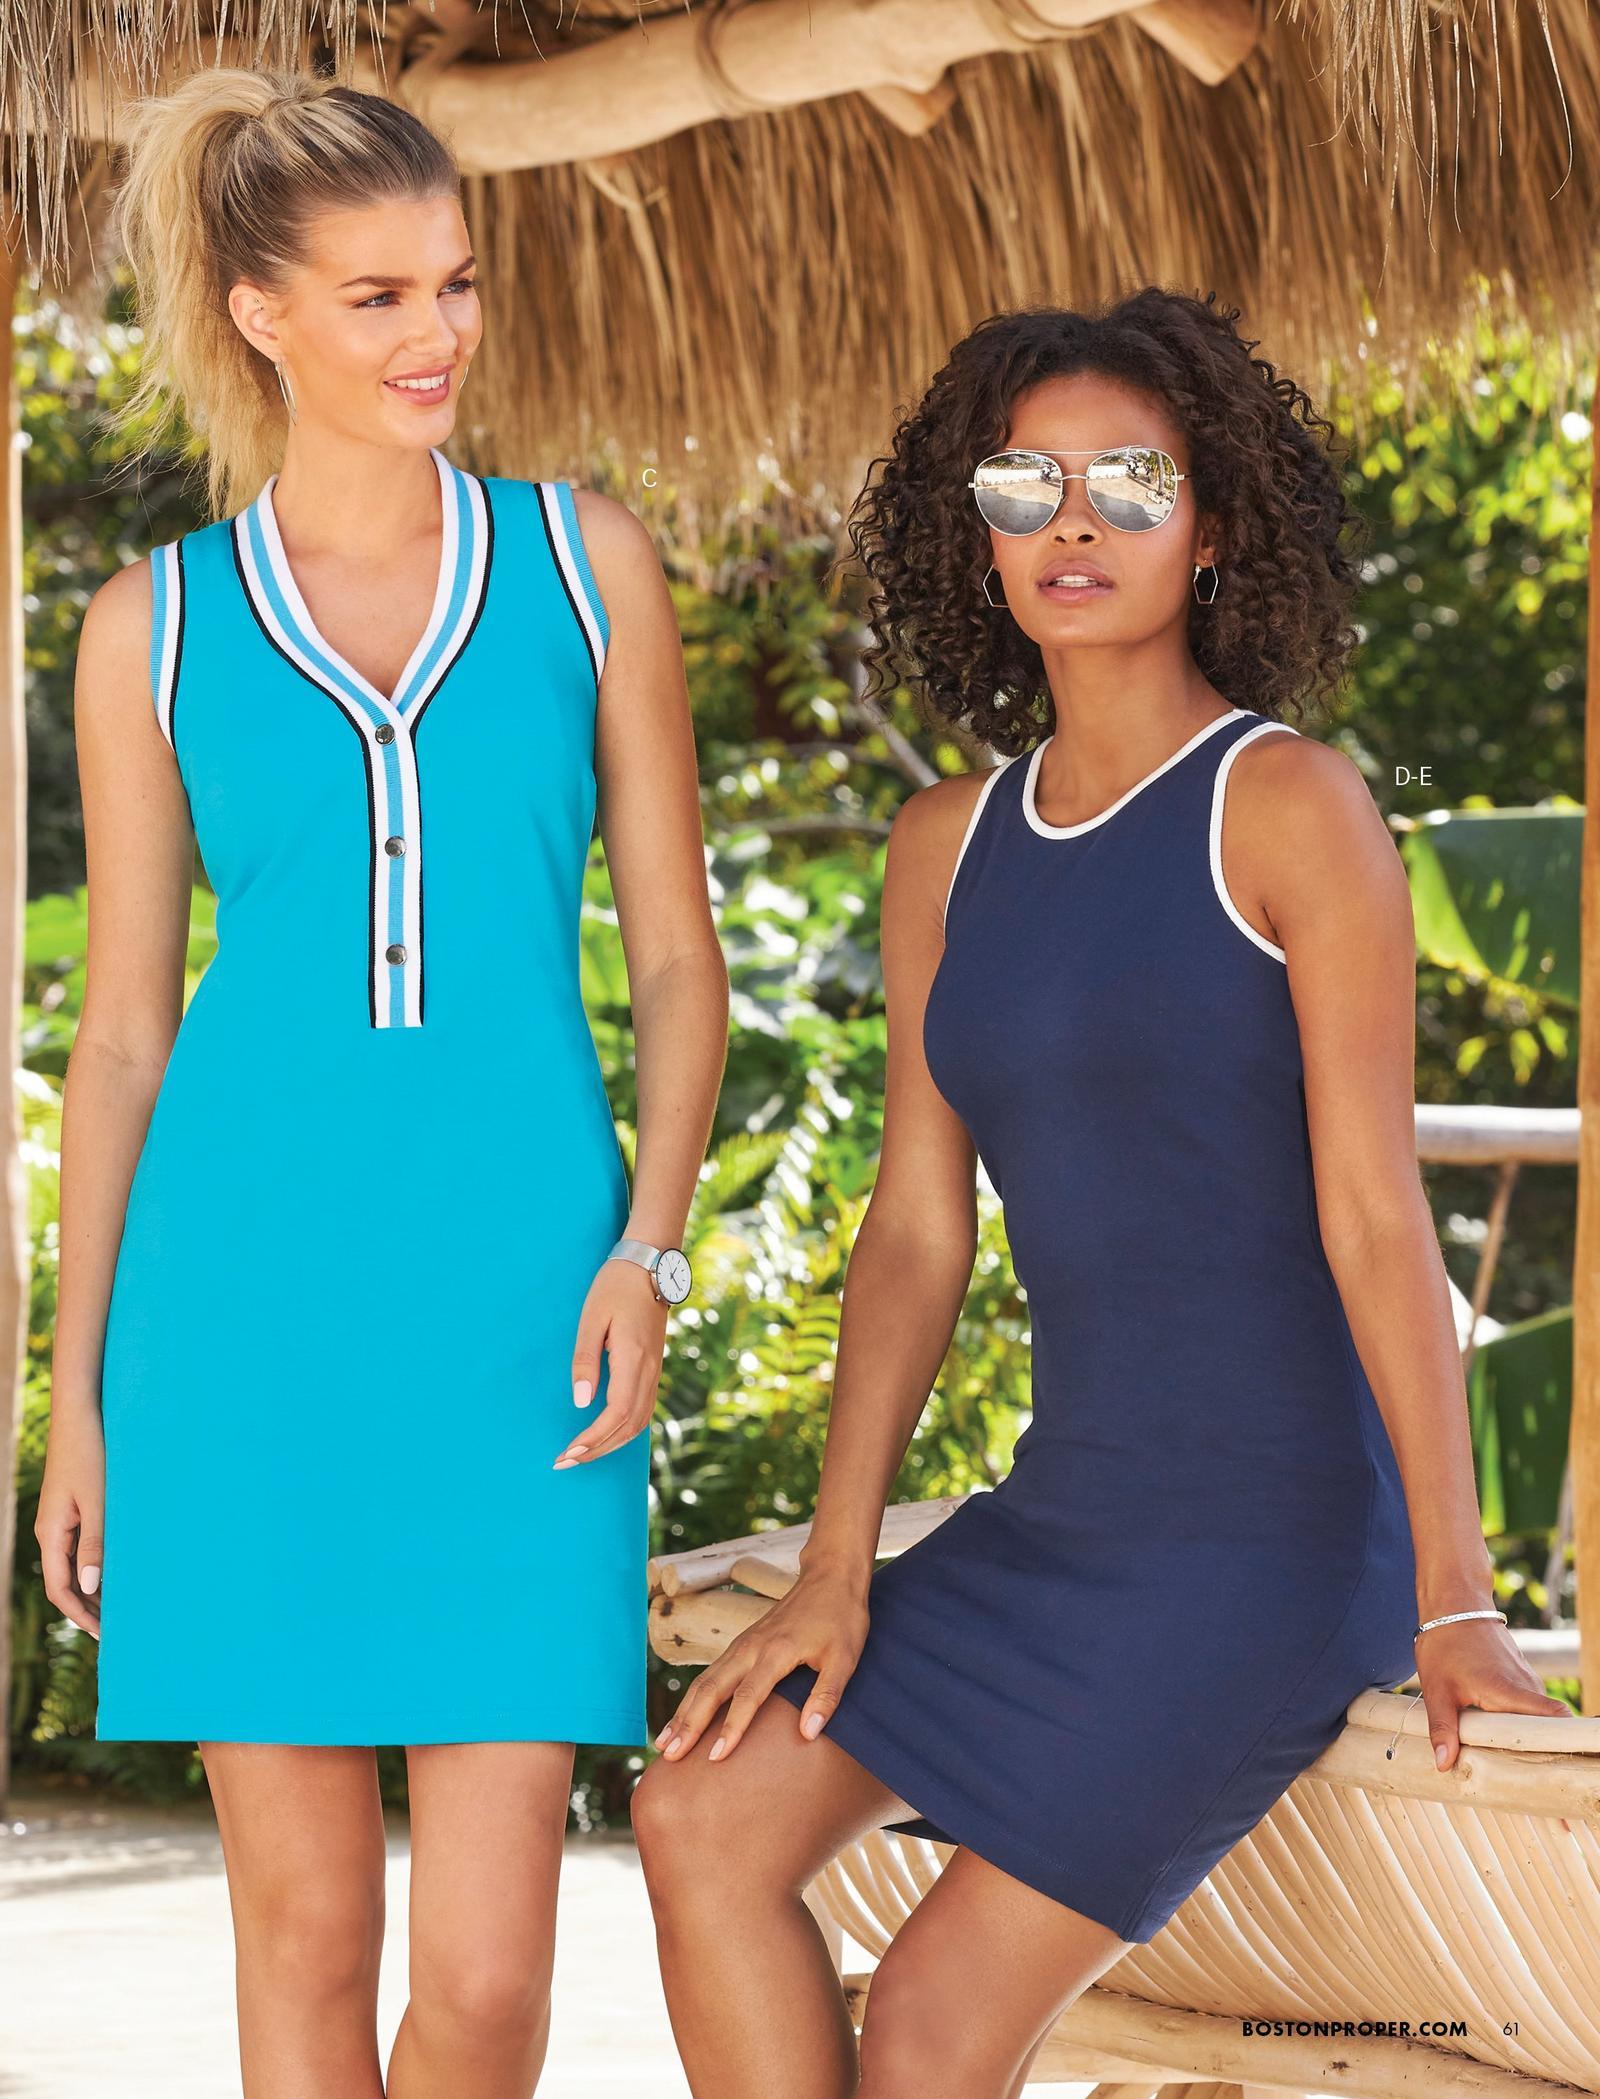 left model wearing a light blue sleeveless sport dress. right model wearing a high-neck sleeveless navy sport dress and sunglasses.